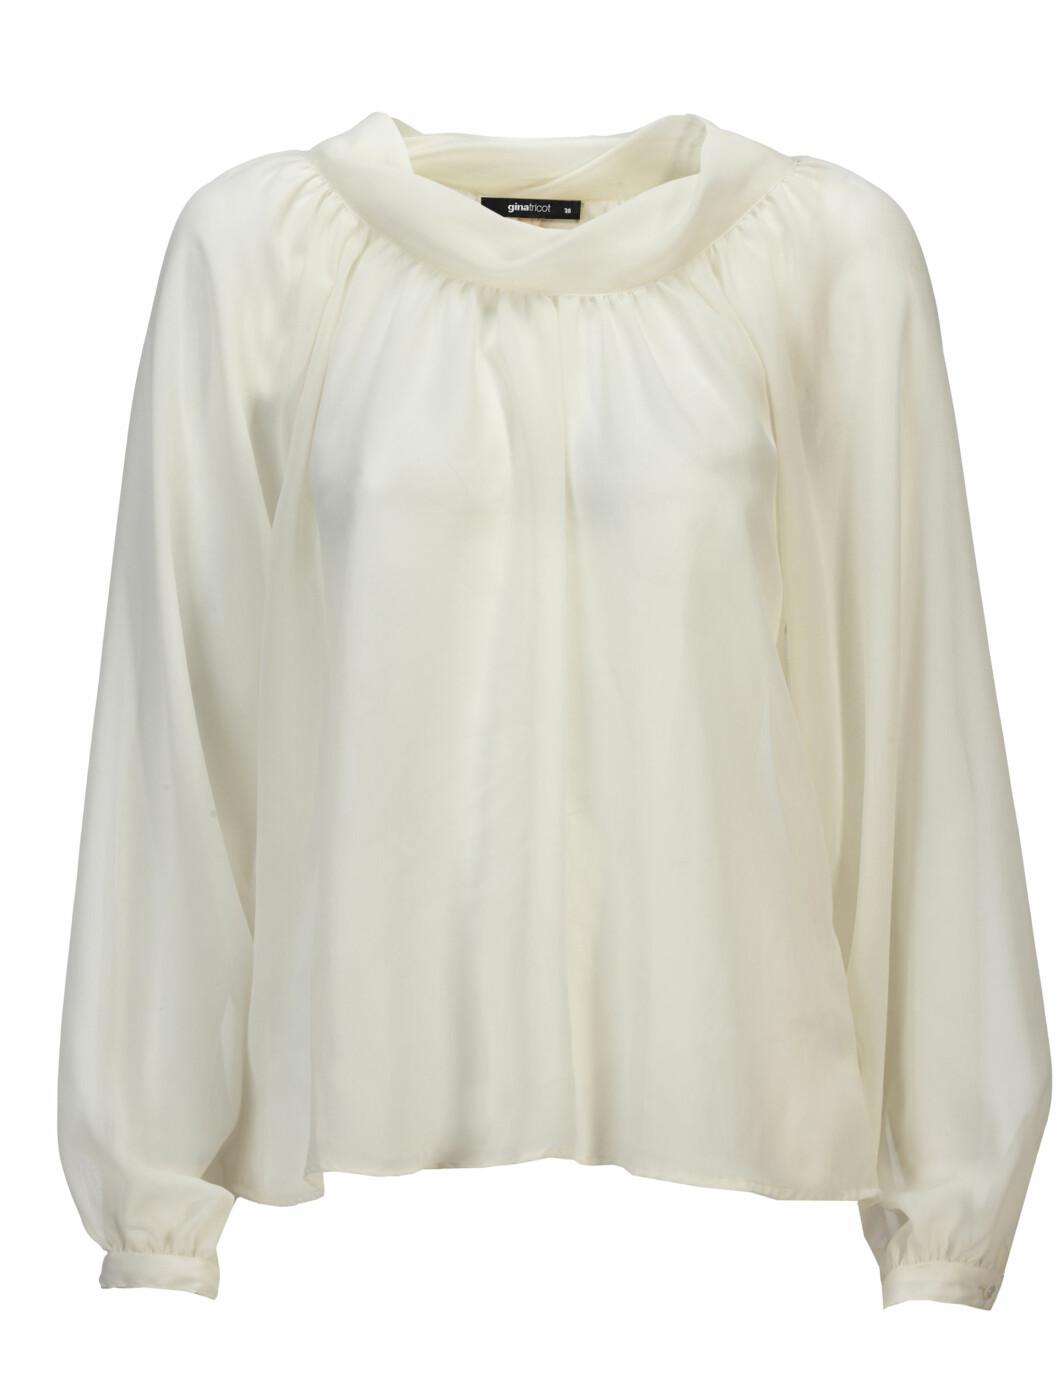 Kremfarget bluse (kr.199). Foto: Produsenten